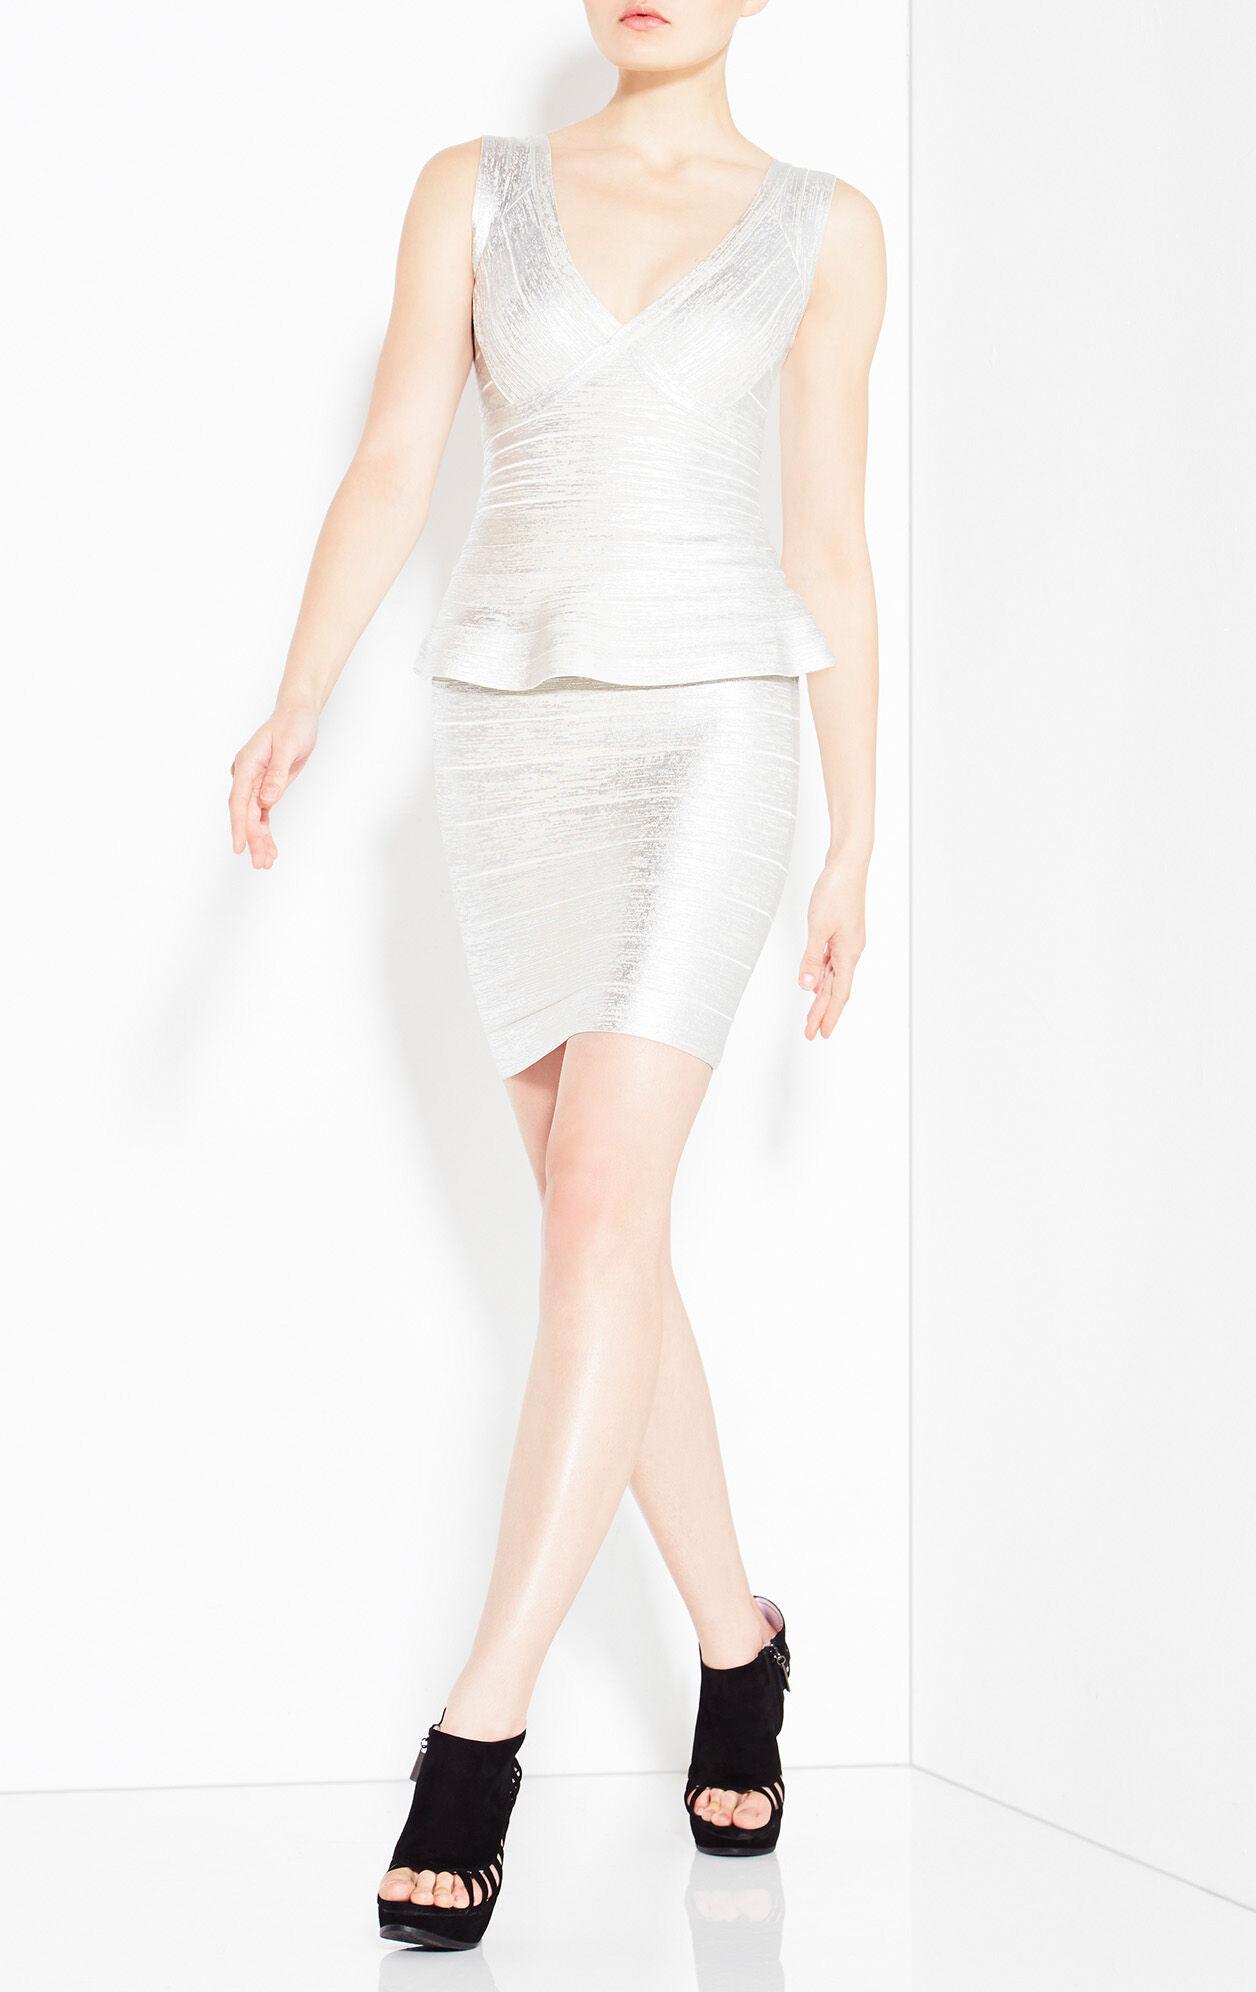 Rebeca Woodgrain Foil Print Dress